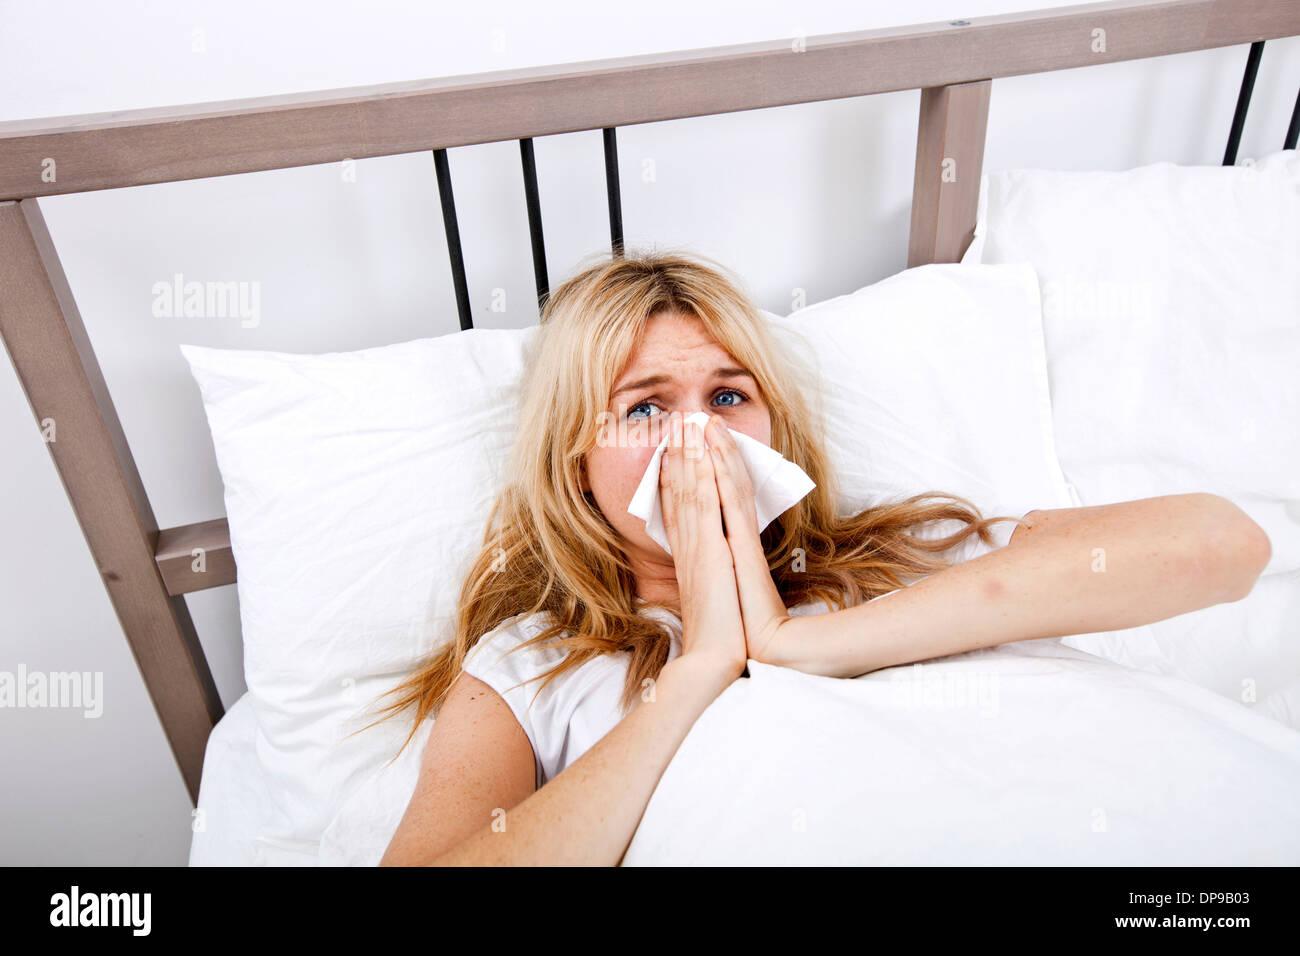 Porträt der Frau leidet Kälte im Bett Stockbild